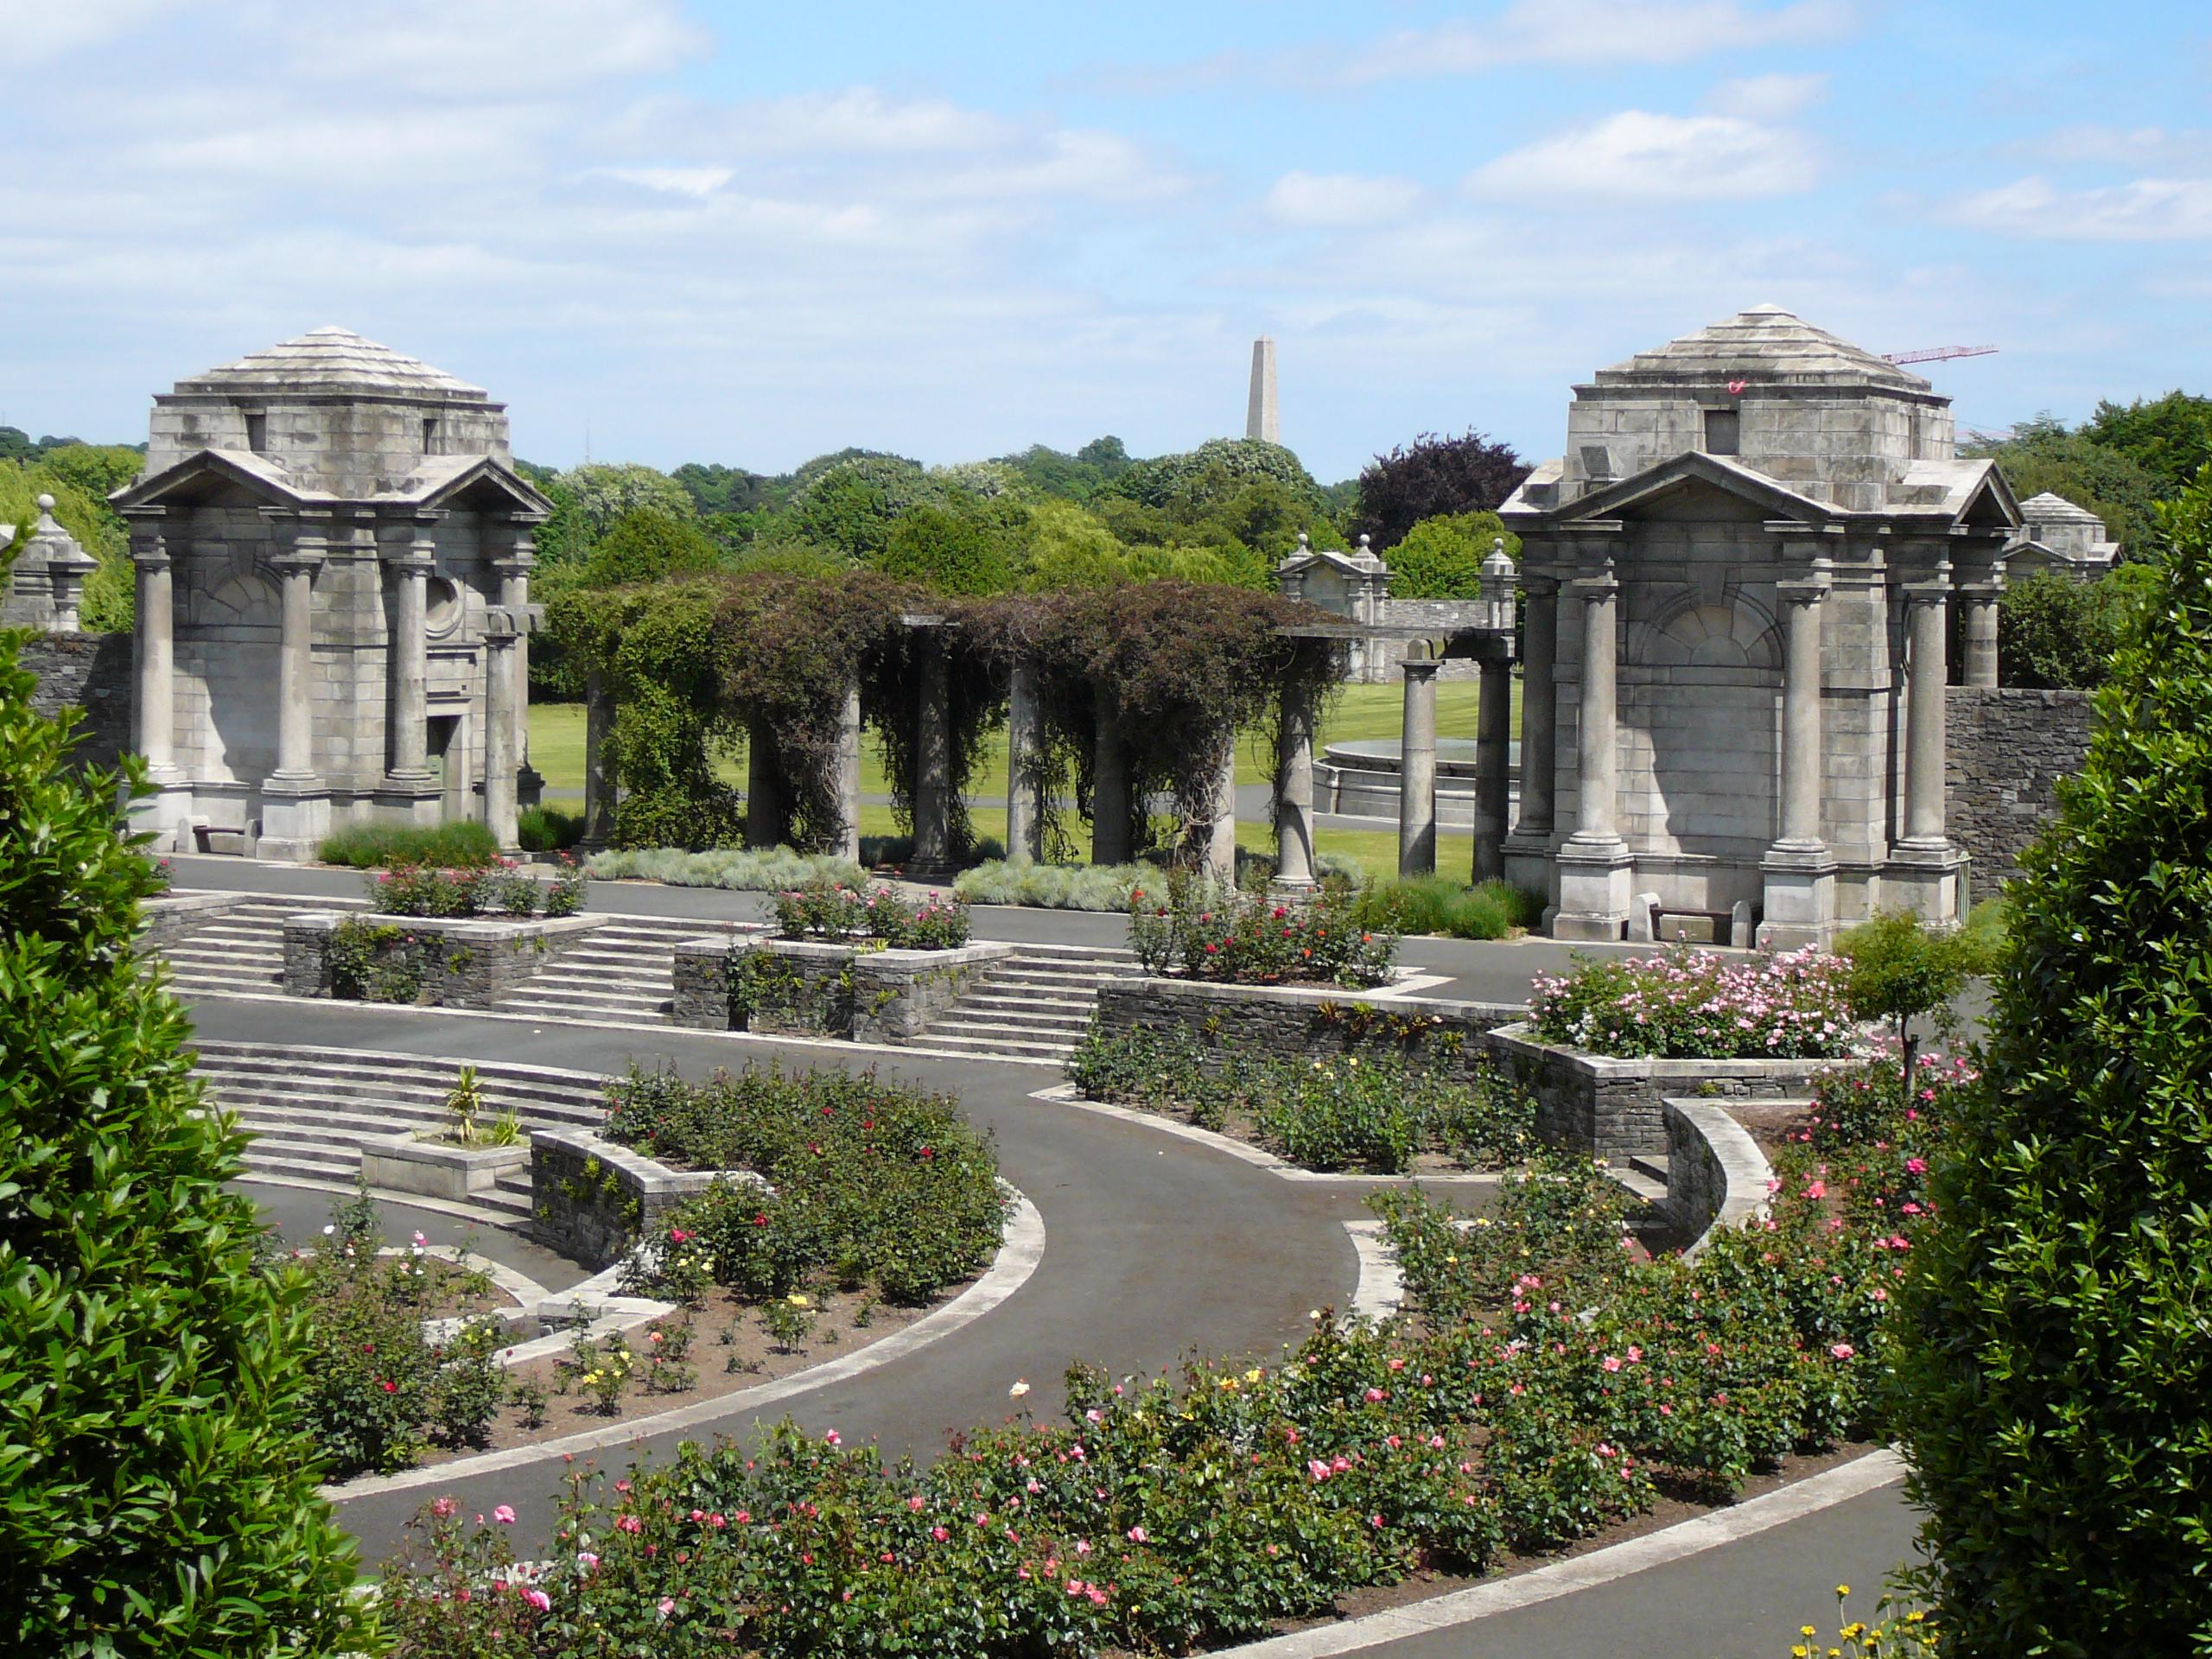 Free garden plans ireland pdf - Free garden plans ireland ...